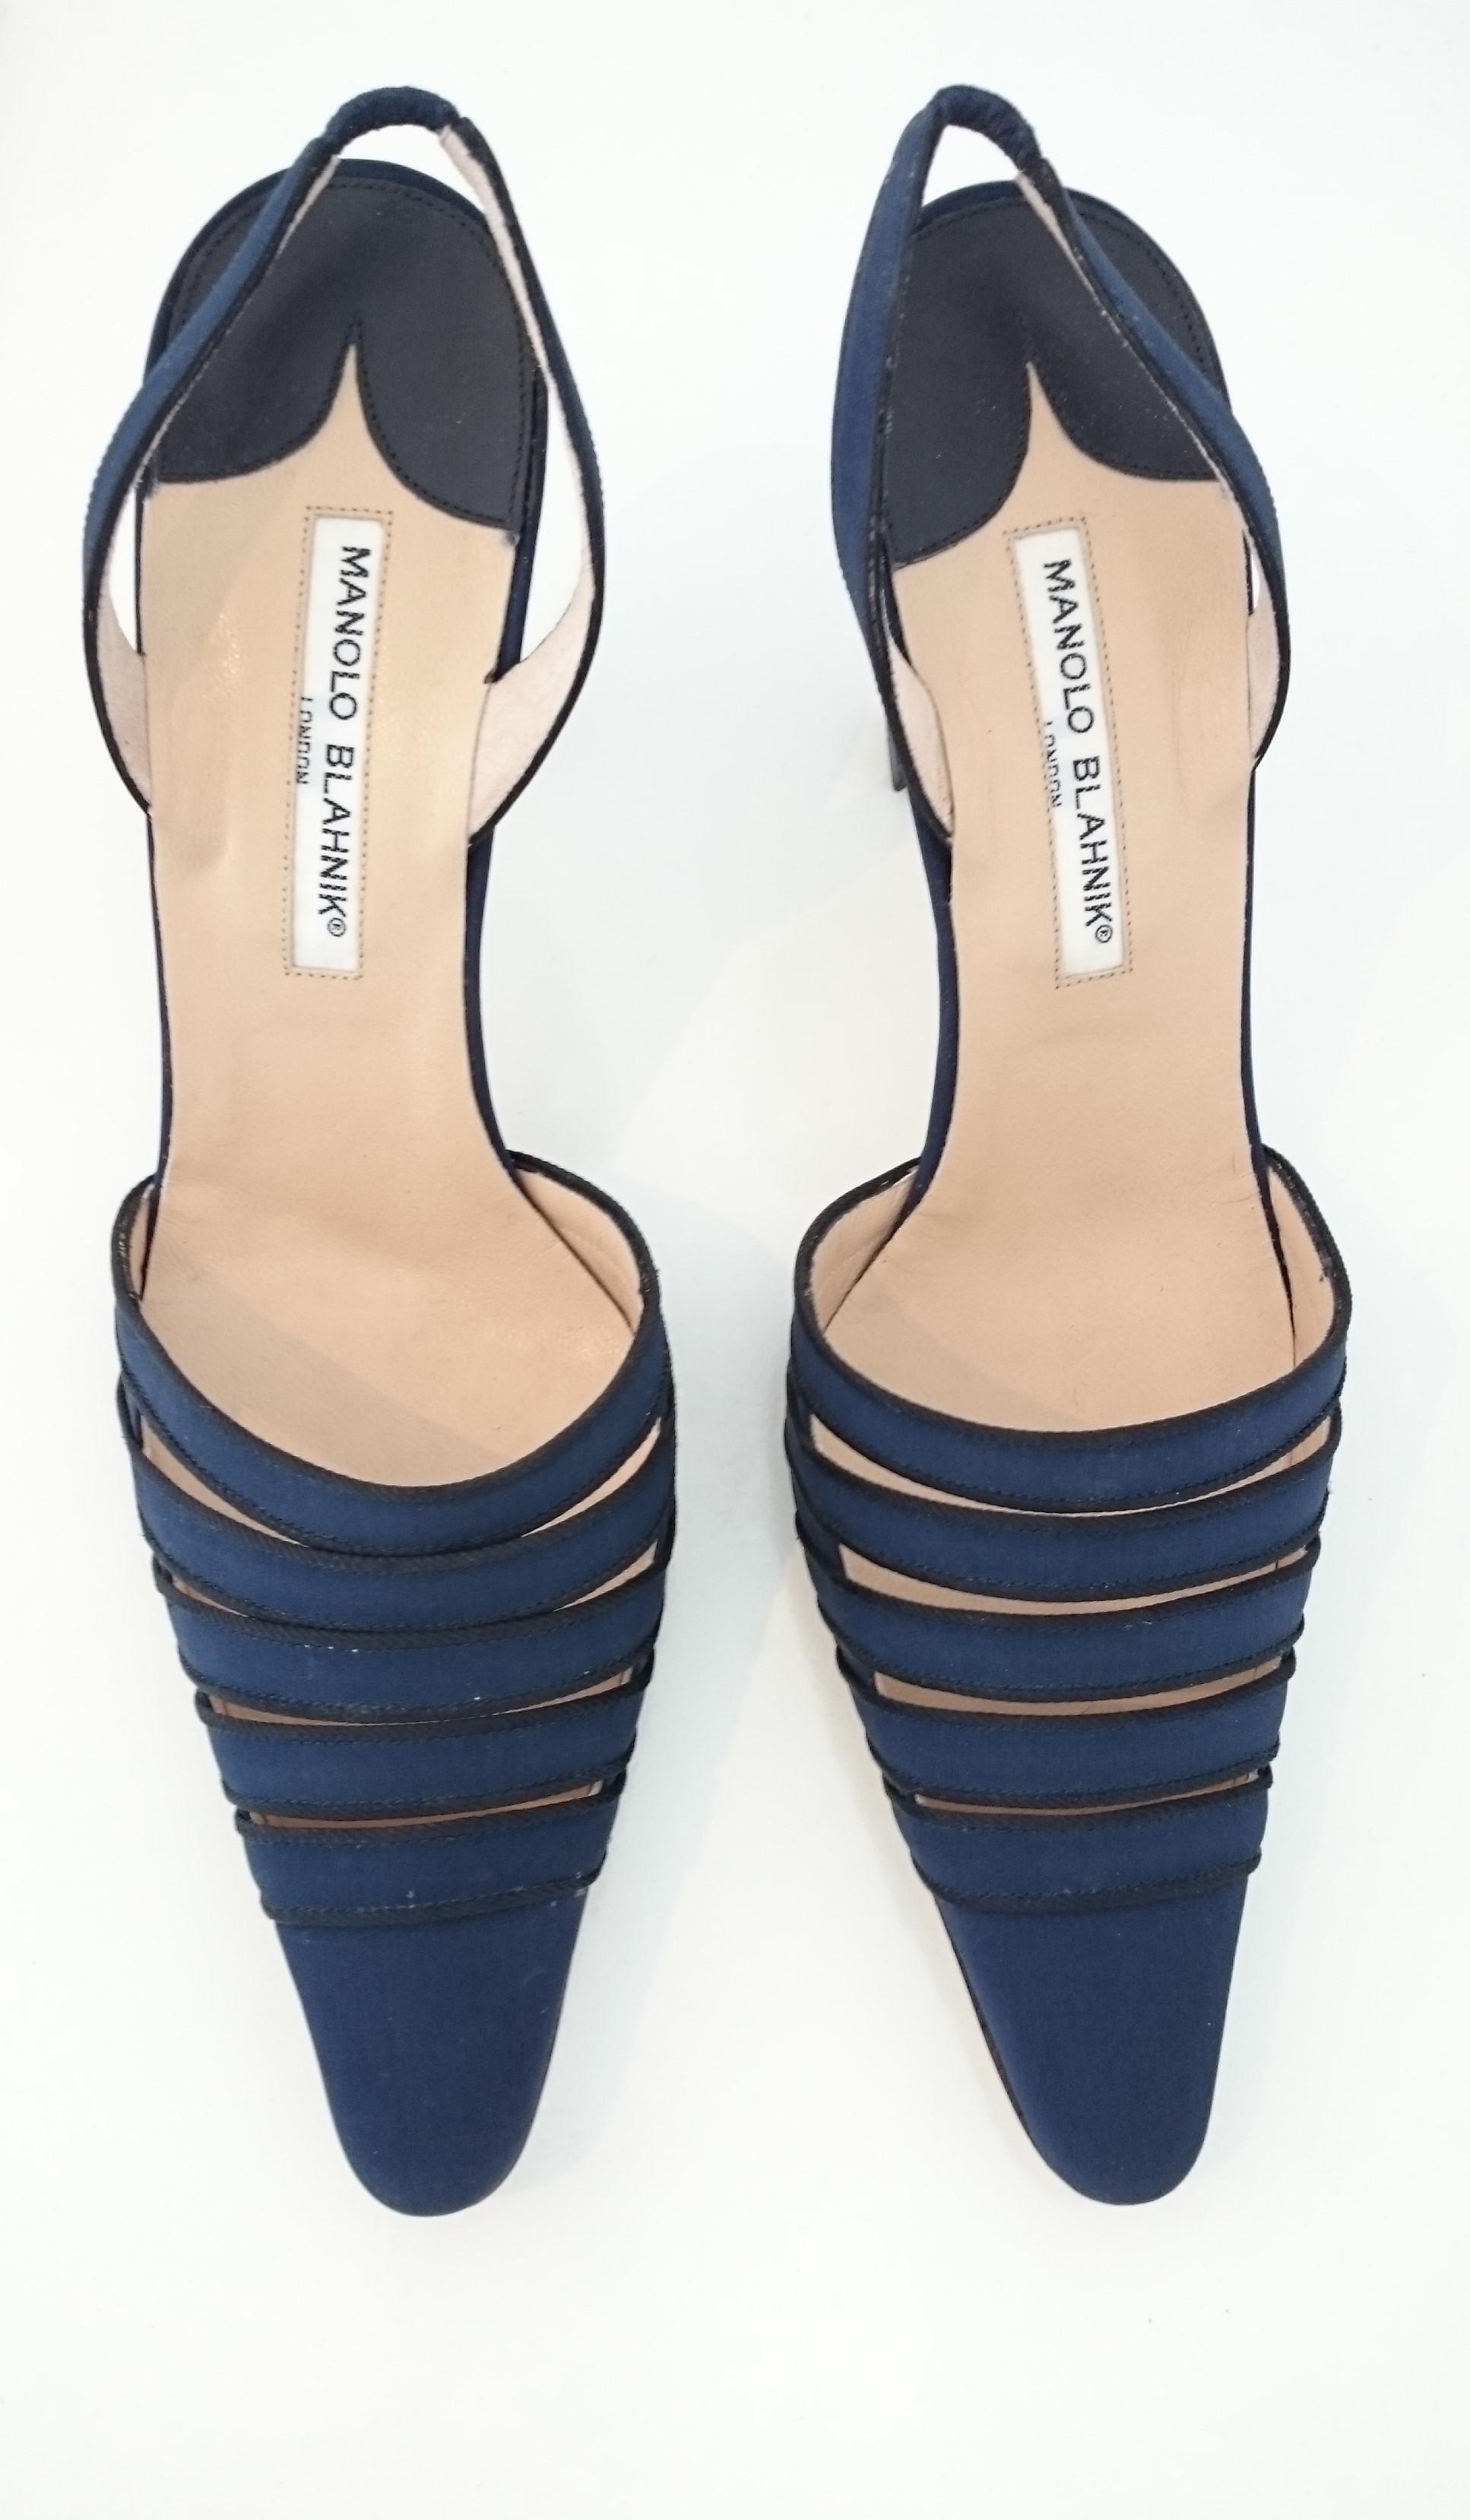 1792274ae5b7b1 Manolo Blahnik Seide Slingback Blaue High Heels. NEU. Größe 40 (EU) im  Angebot bei 1stdibs